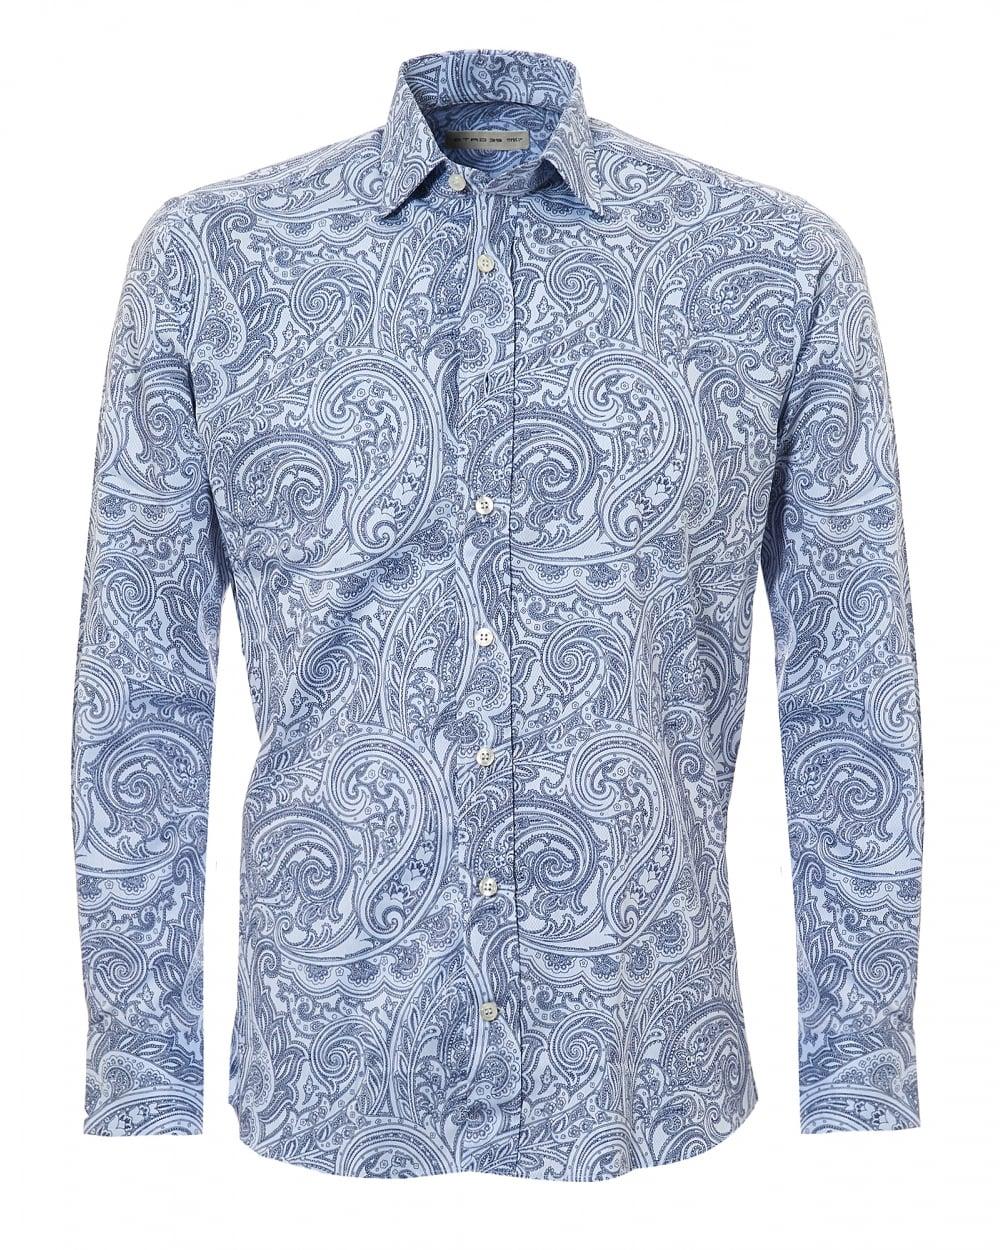 Etro mens mens paisley print regular fit navy sky blue shirt for Etro men s shirts